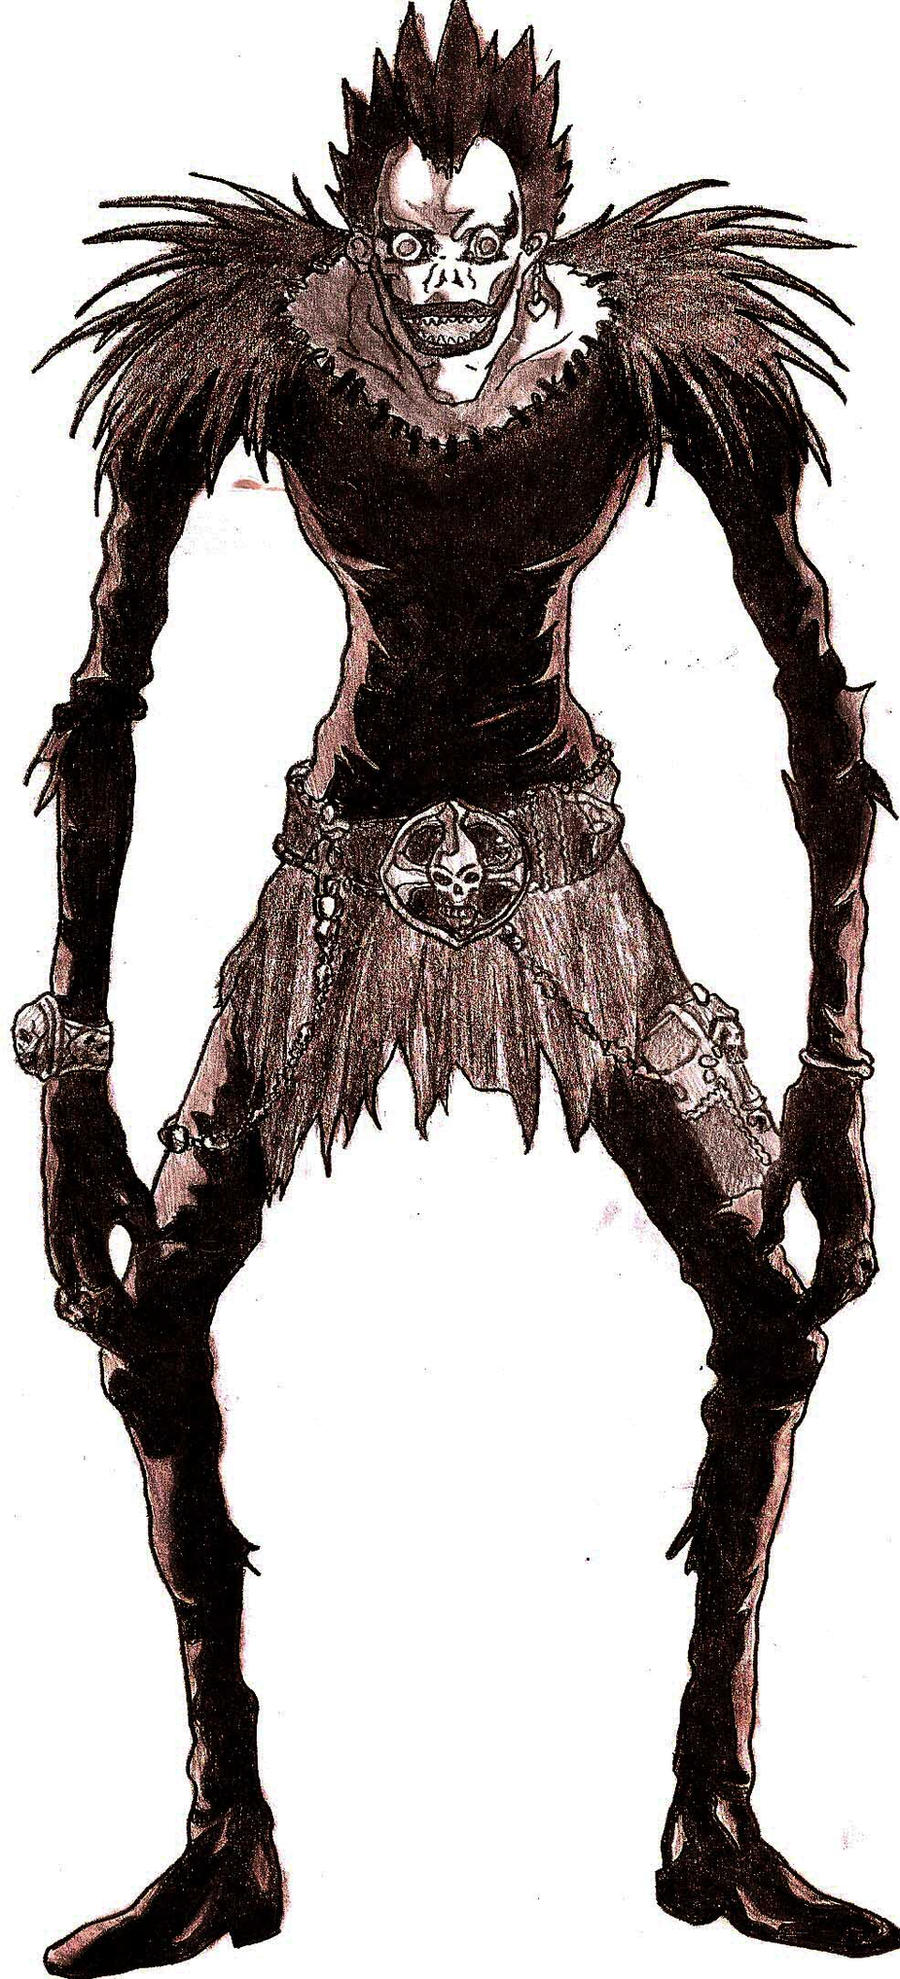 Death Note Shinigami: Ryuk by TH-SharOon on DeviantArt